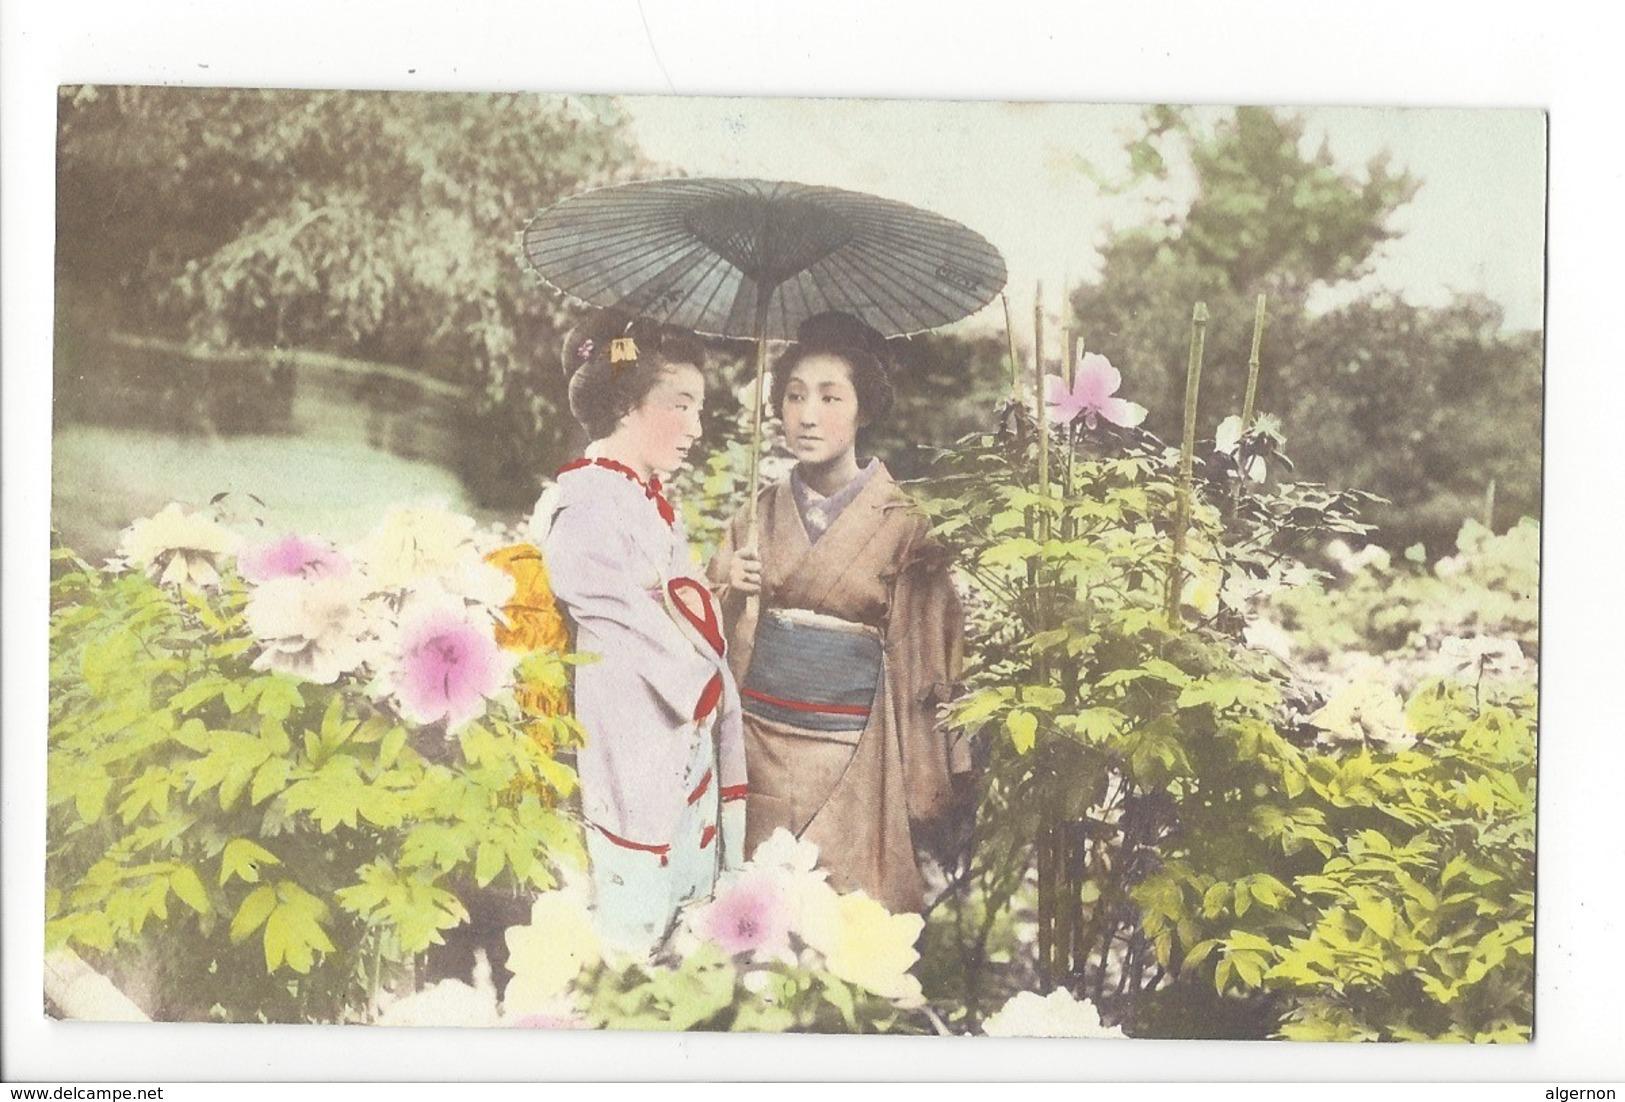 19732 - FEMMES - FRAU - LADY - JAPON - JAPAN - Jolie Carte Femme Japonaise Geisha Japanese Woman Umbrella - Japon